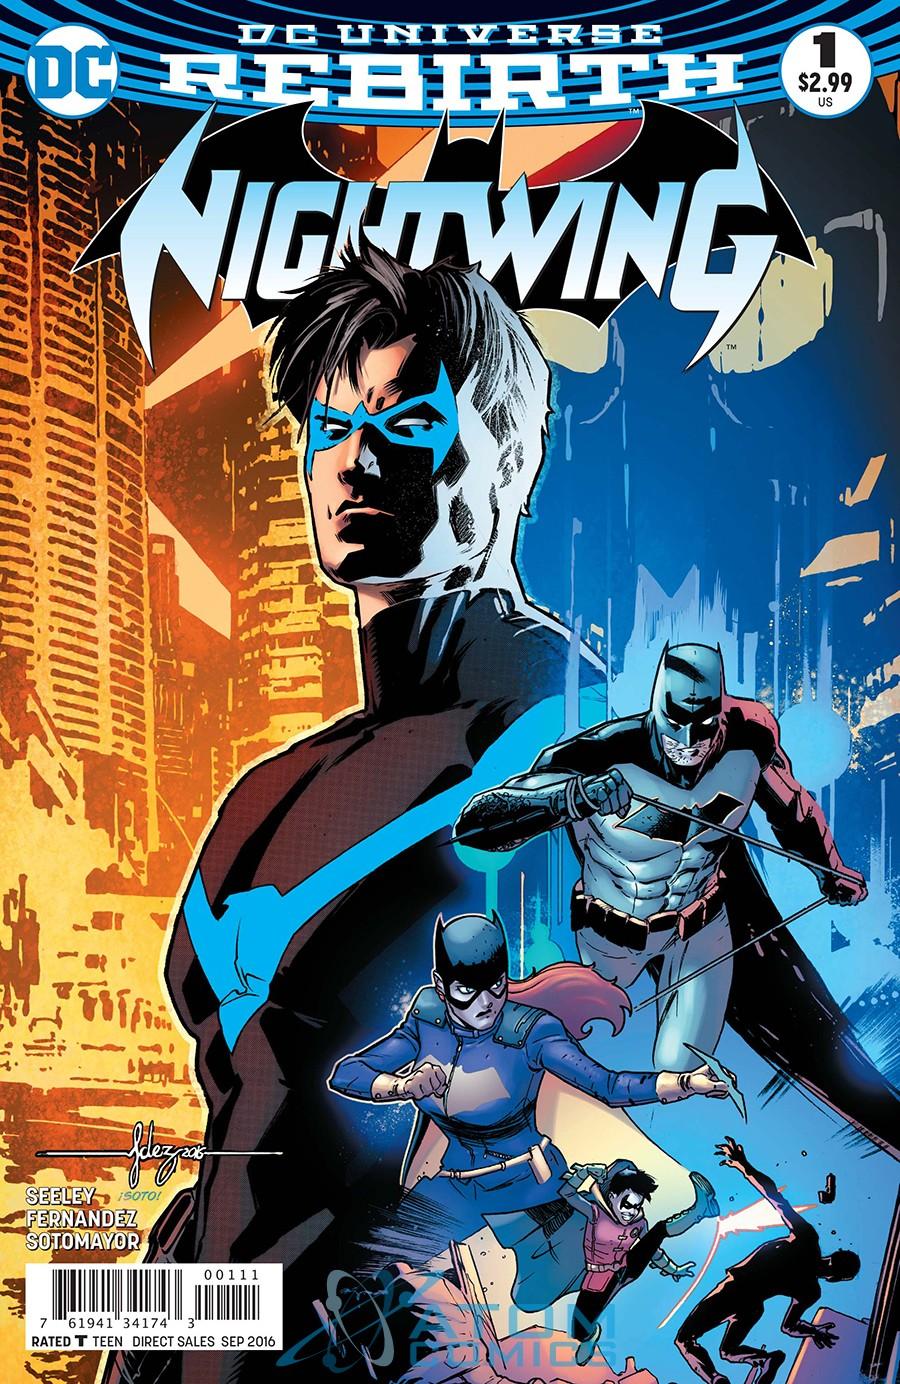 foto: okładka komiksu Rebirth: Nightwing #1